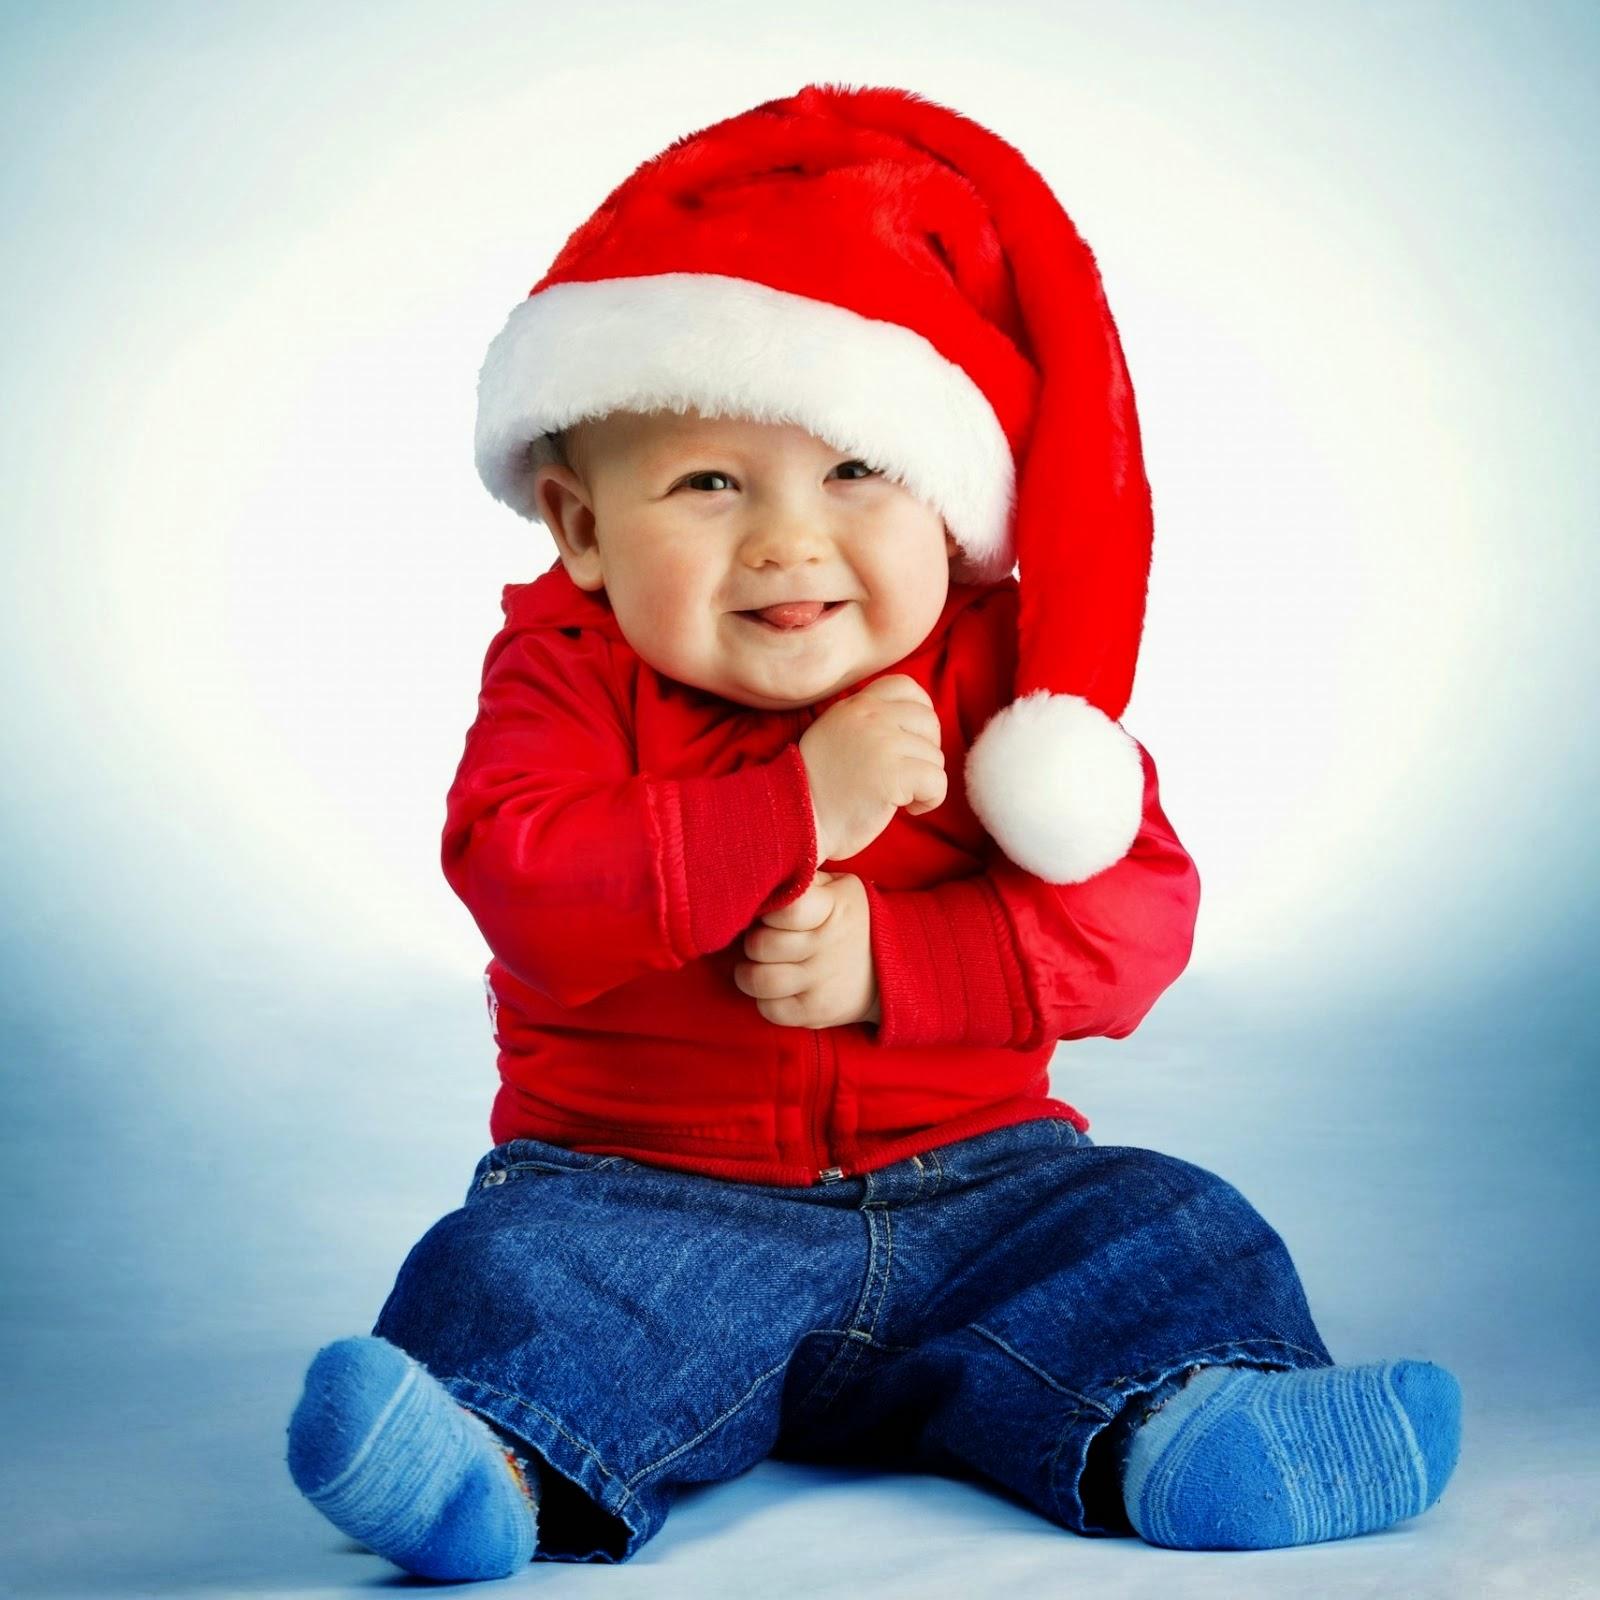 ♥ ♫ ♥ So Cute Happy Baby Christmas ♥ ♫ ♥